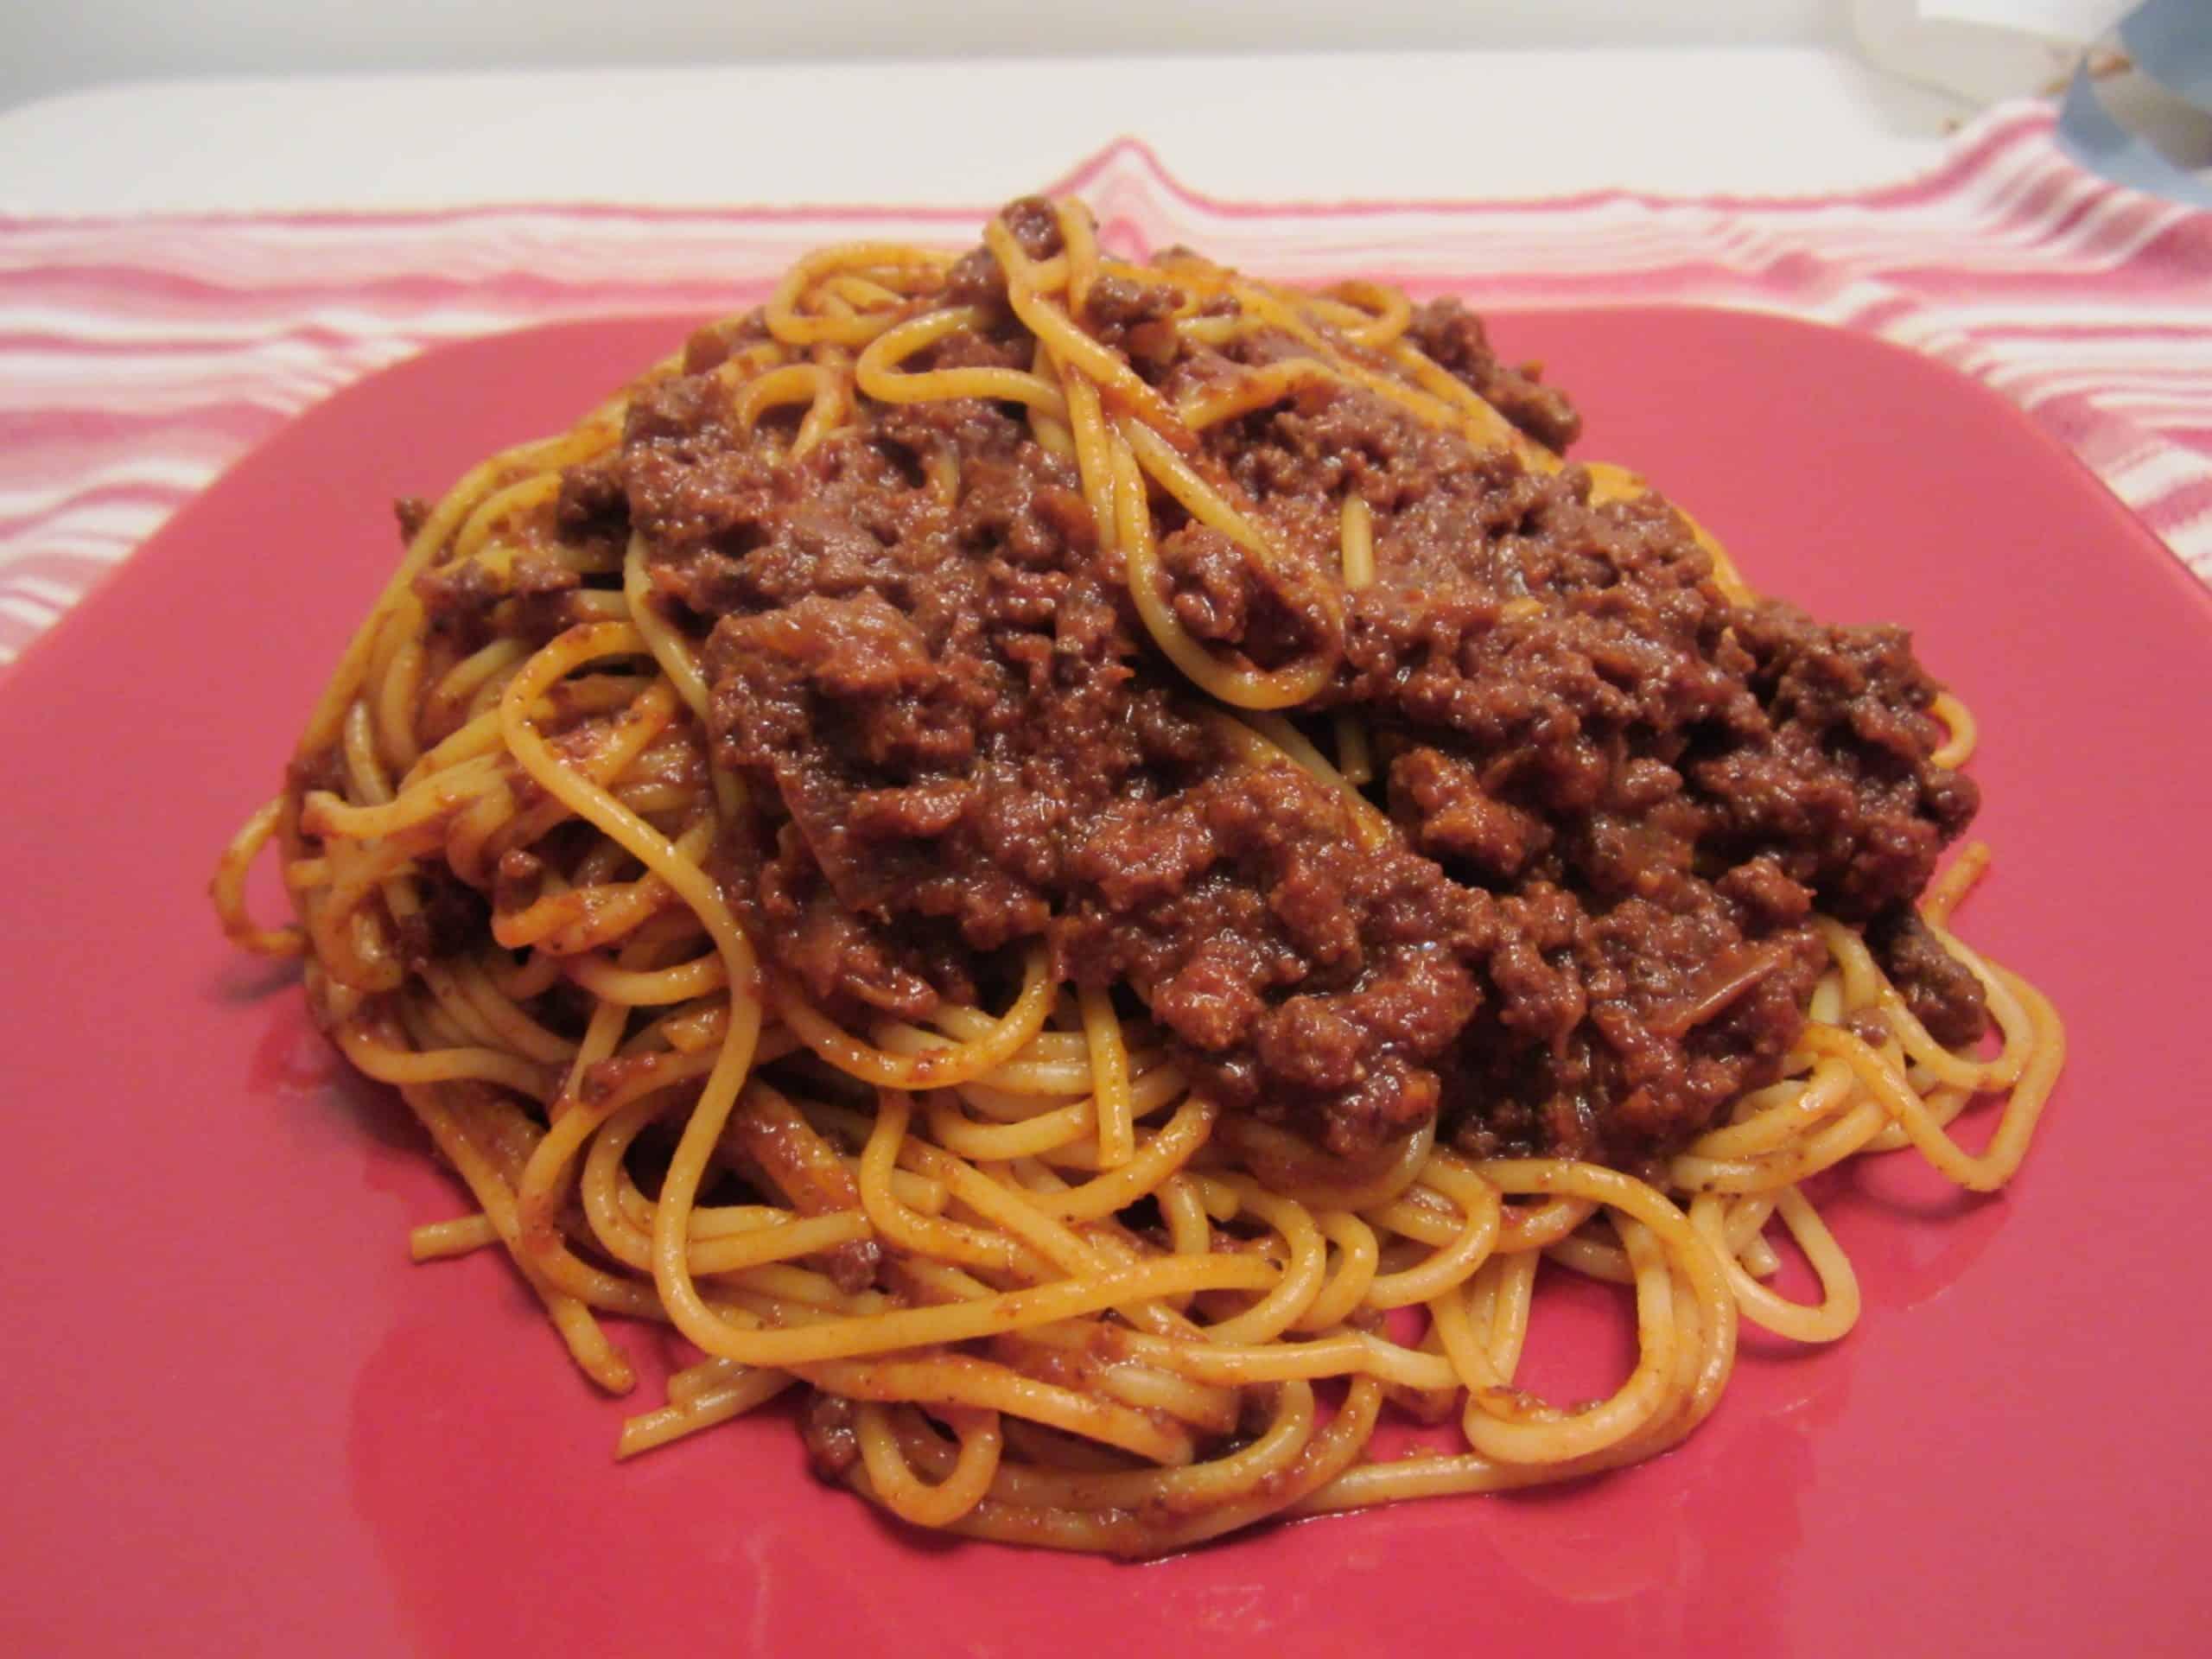 Colonel Sanders' Spaghetti Sauce (Allegedly)